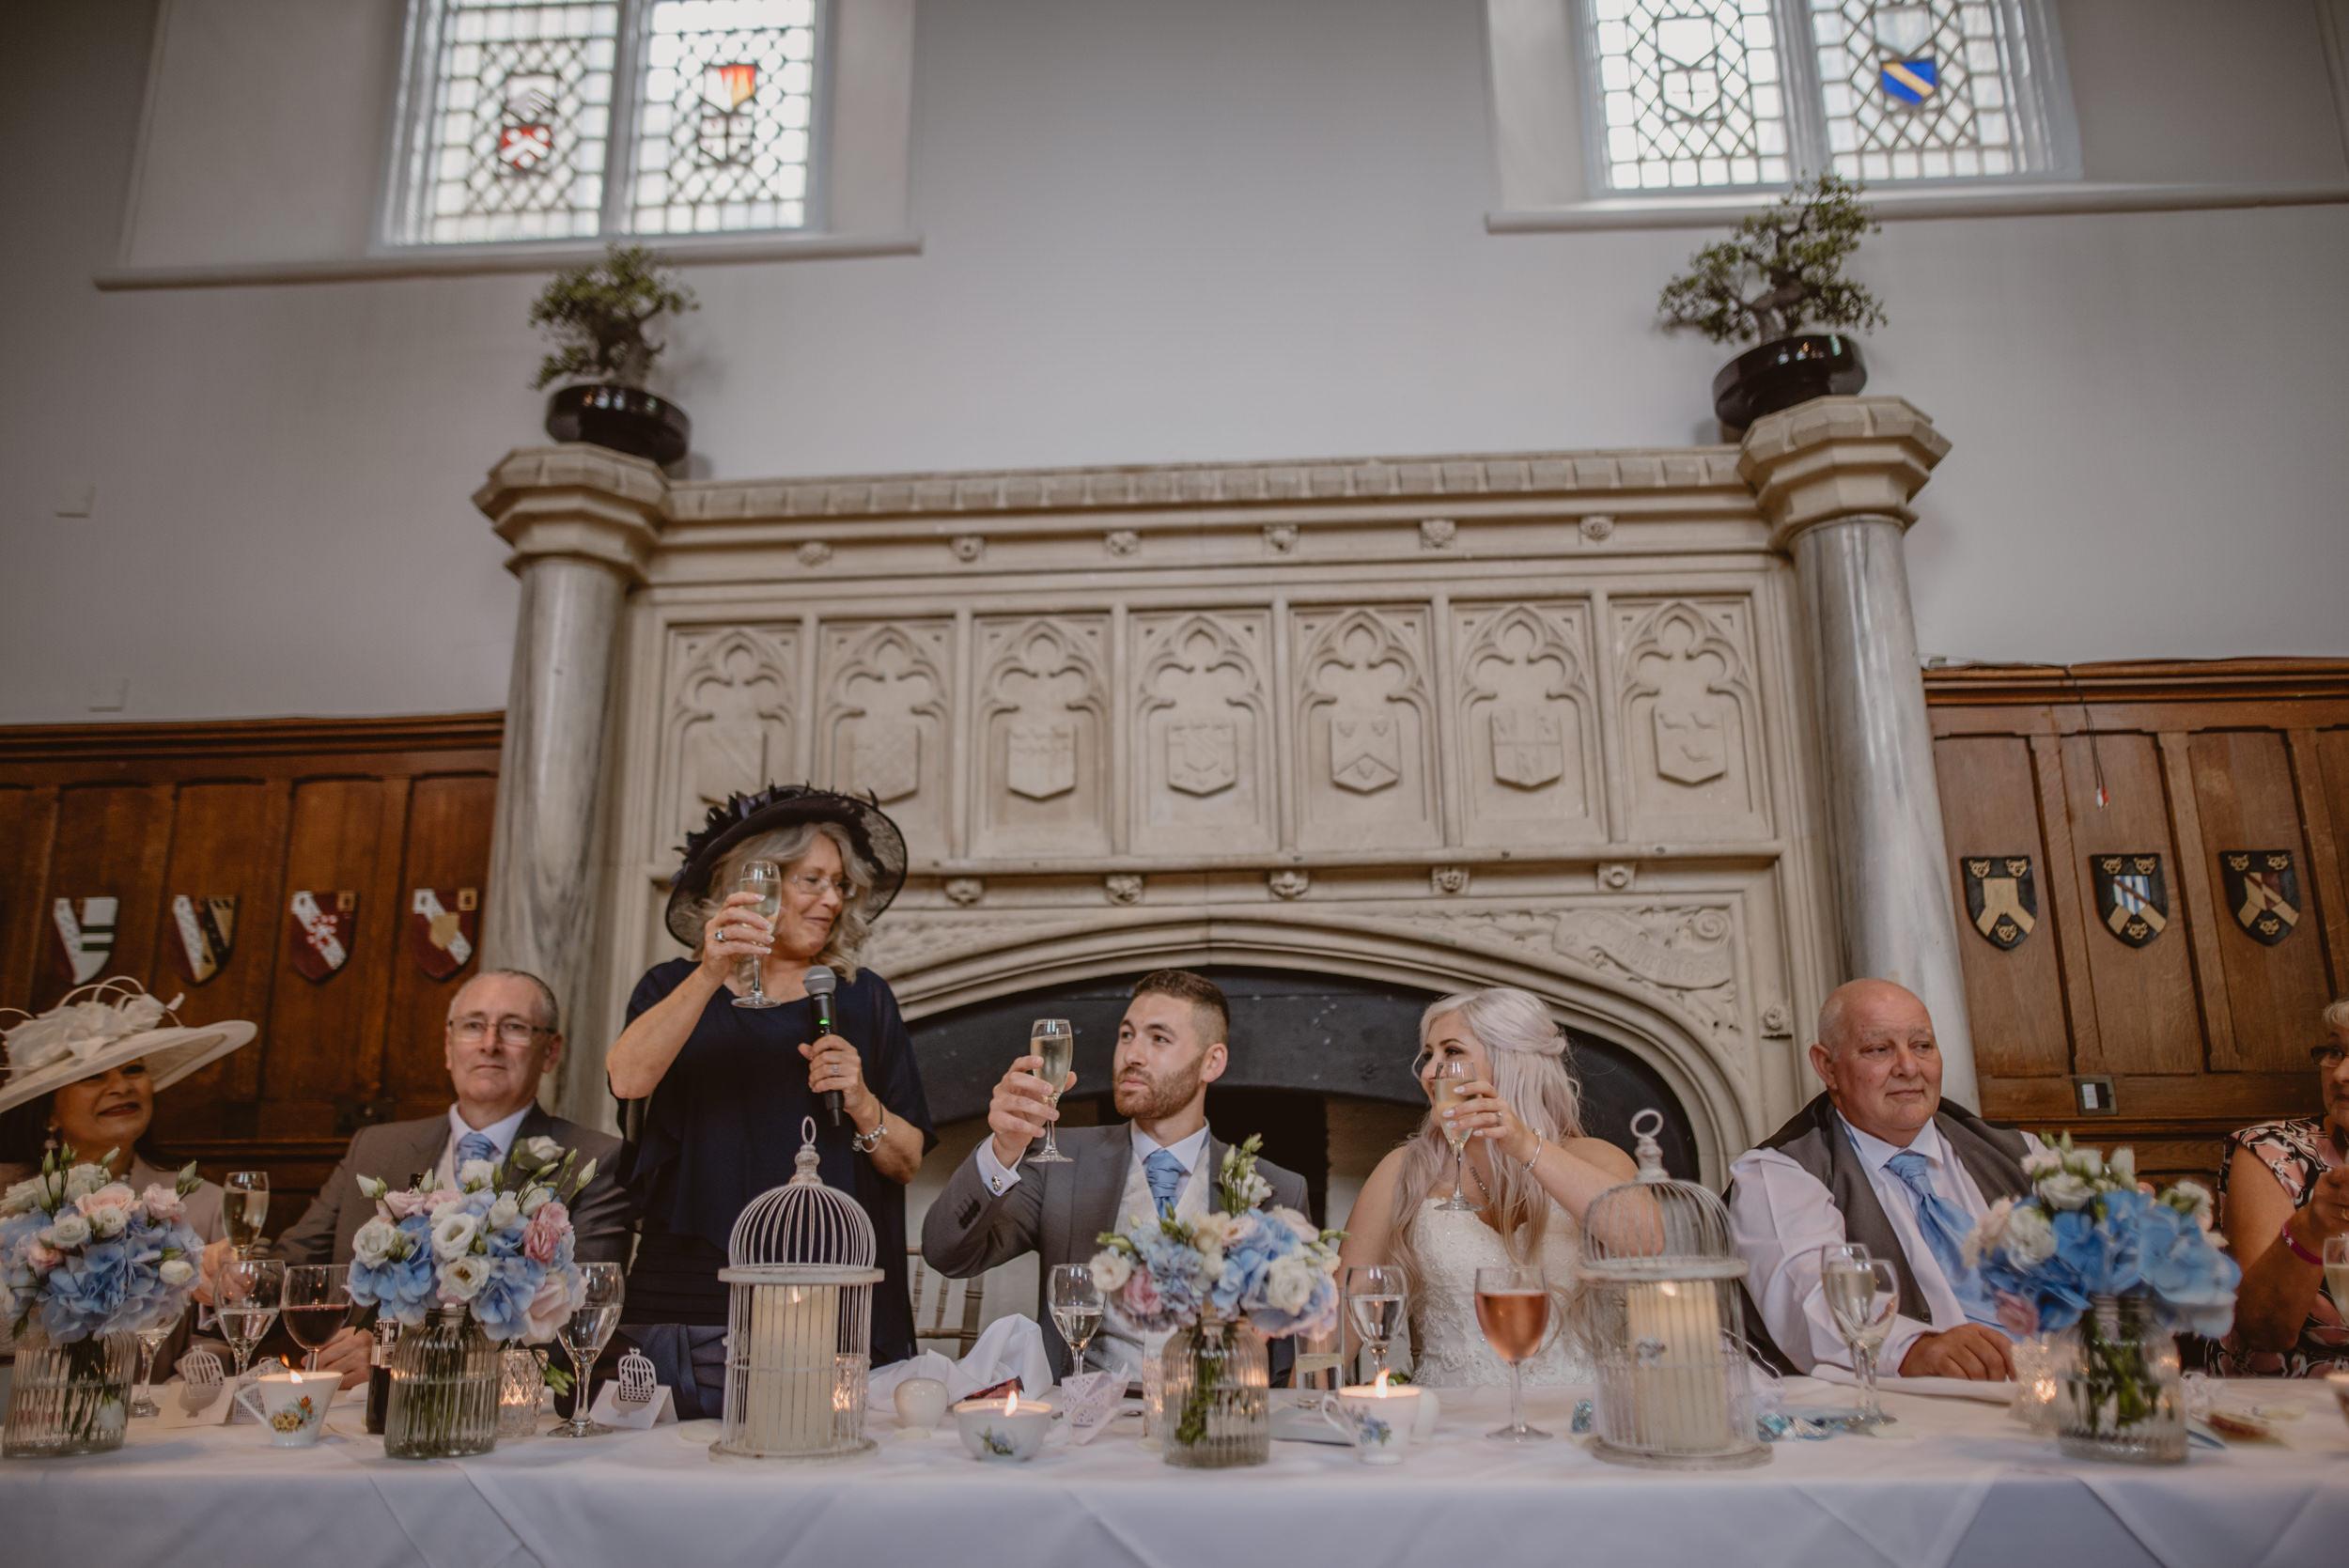 Rachel-and-James-Wedding-Horsley-Towers-State-Manu-Mendoza-Wedding-Photography-396.jpg